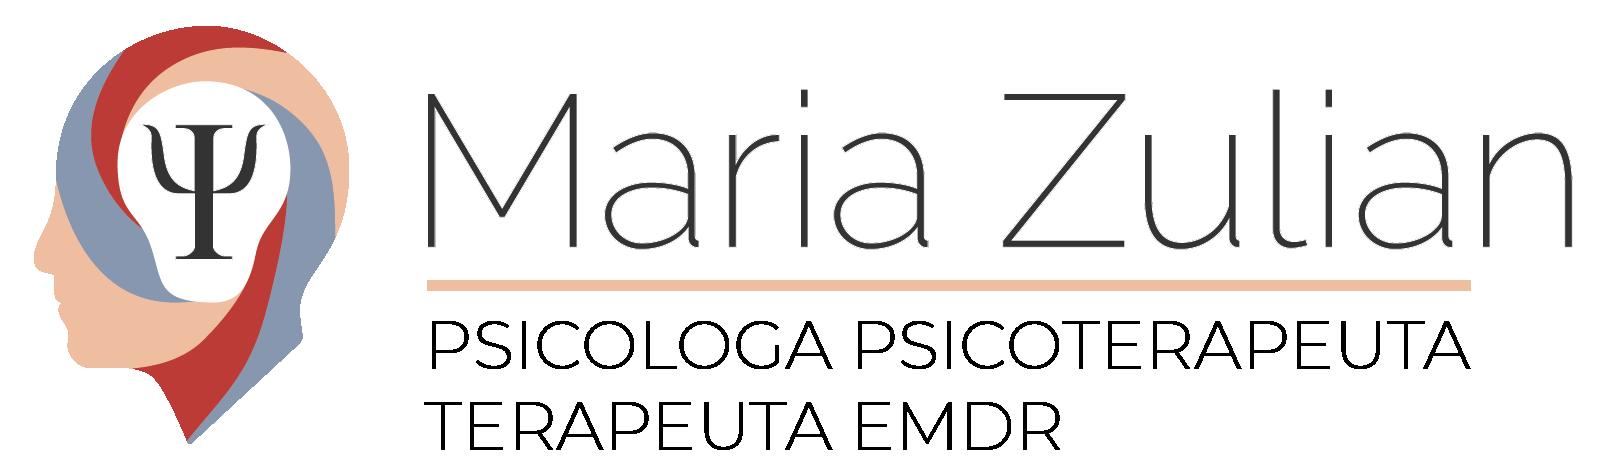 Dott.ssa Maria Zulian - Psicologa a Treviso